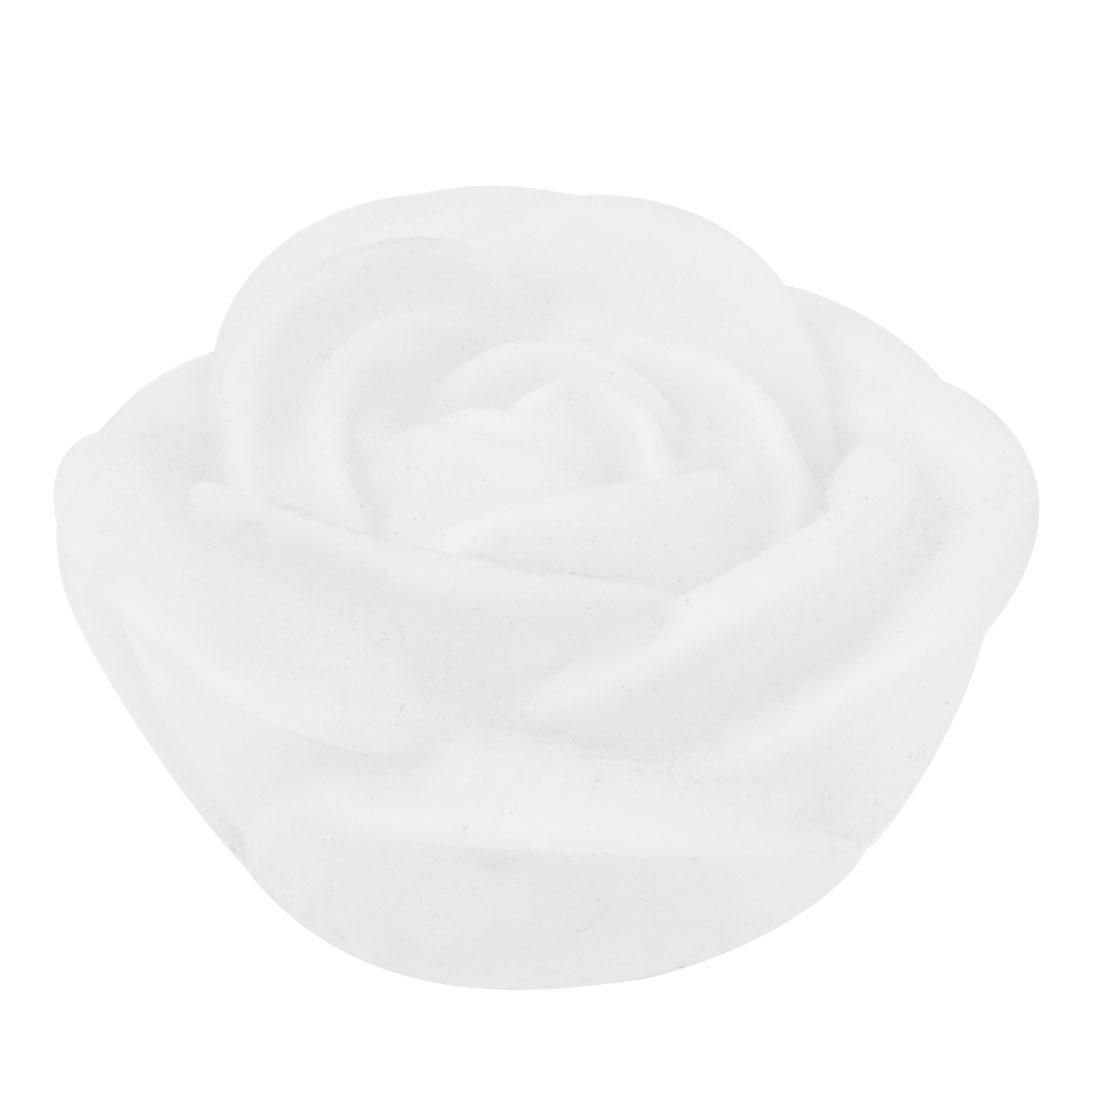 Bedroom White Plastic Rose Colorful LED Light Night Lamp